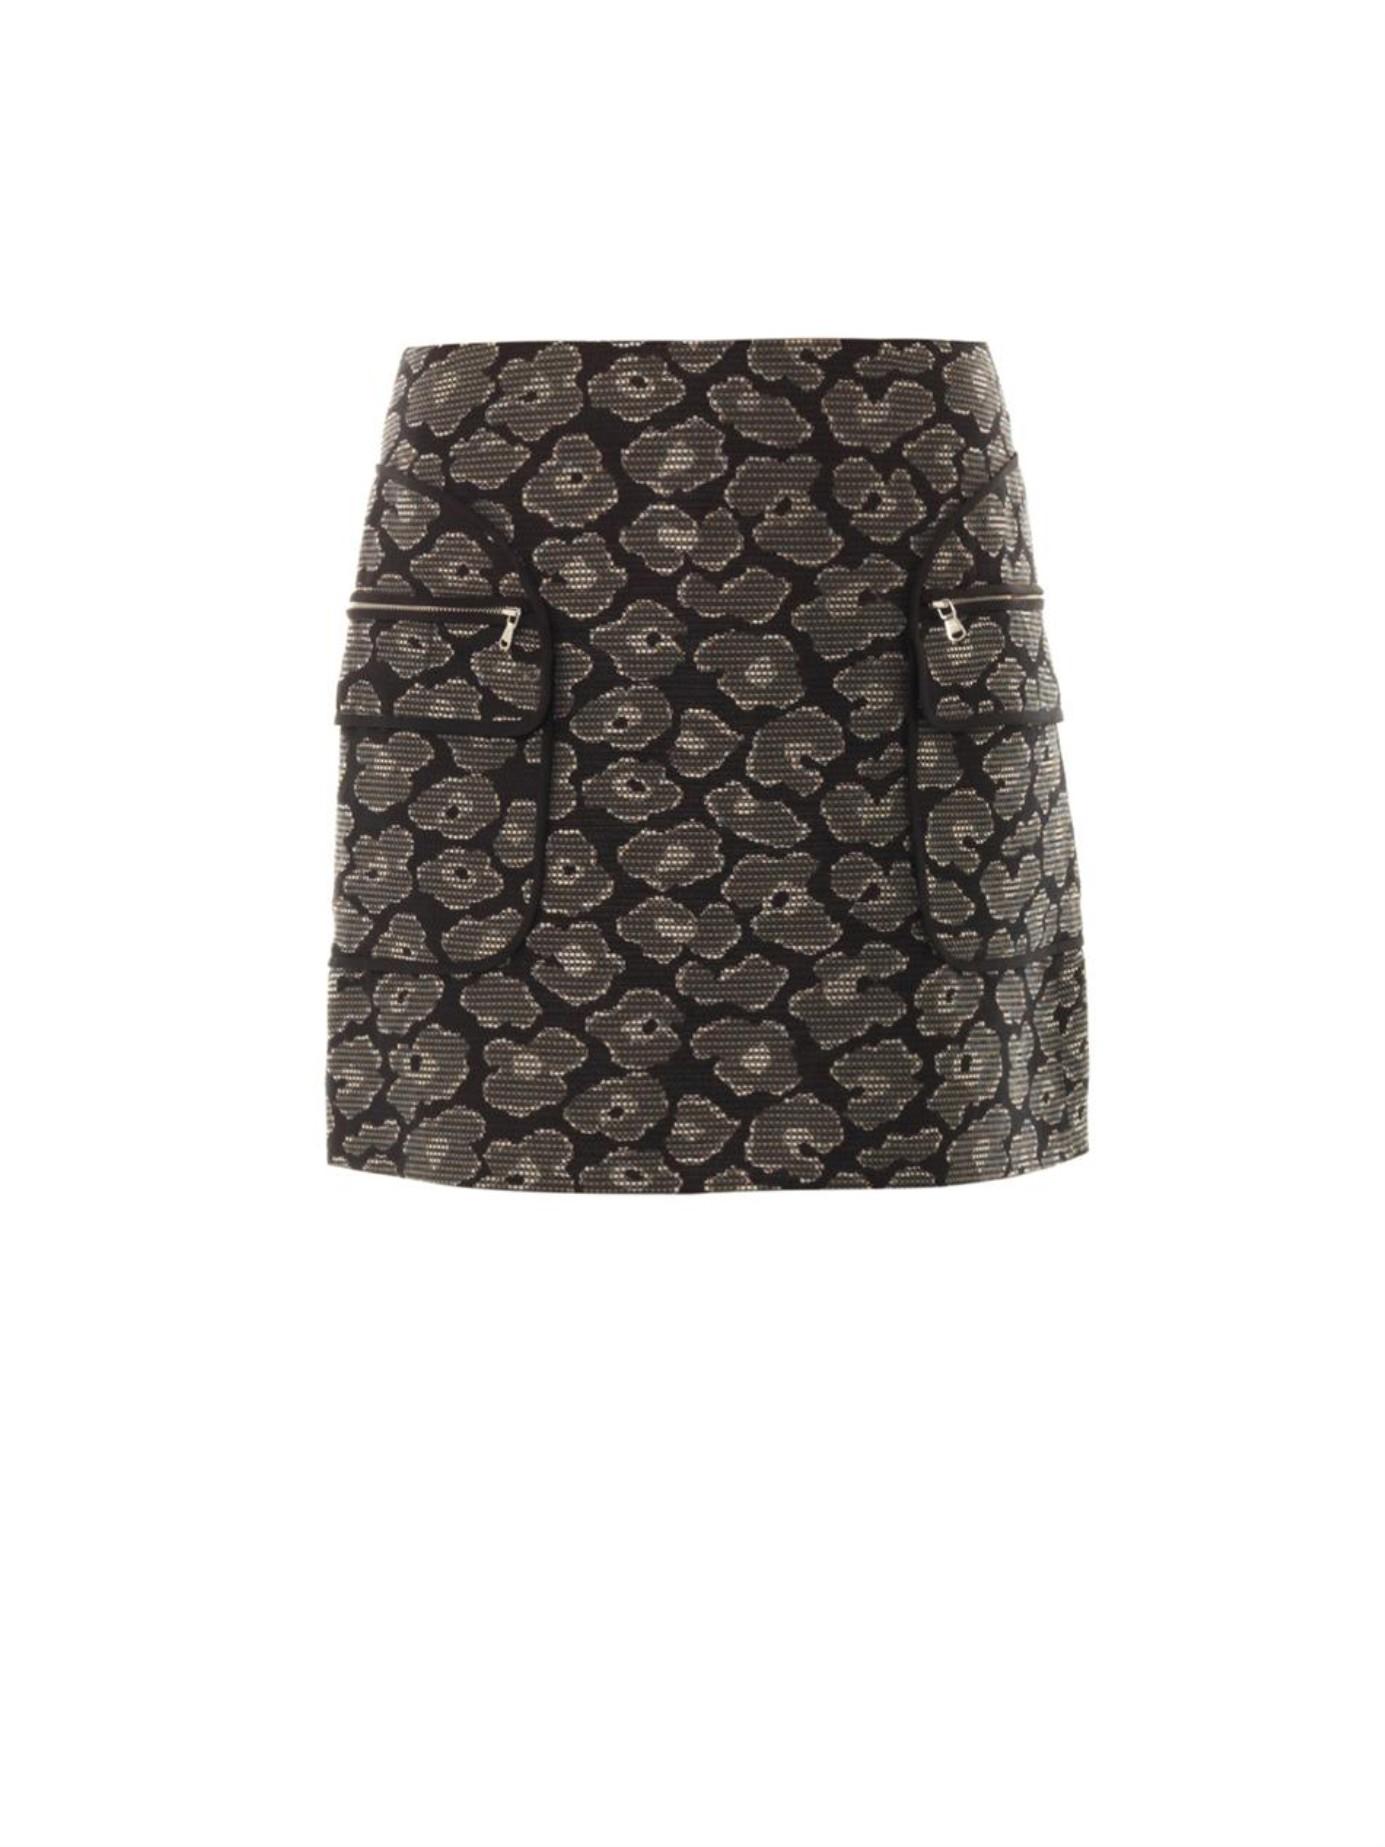 Cotton-blend skirt Marc Jacobs Discount Authentic Discount Official Site Sale Marketable Visit For Sale Sale With Credit Card akEK0b